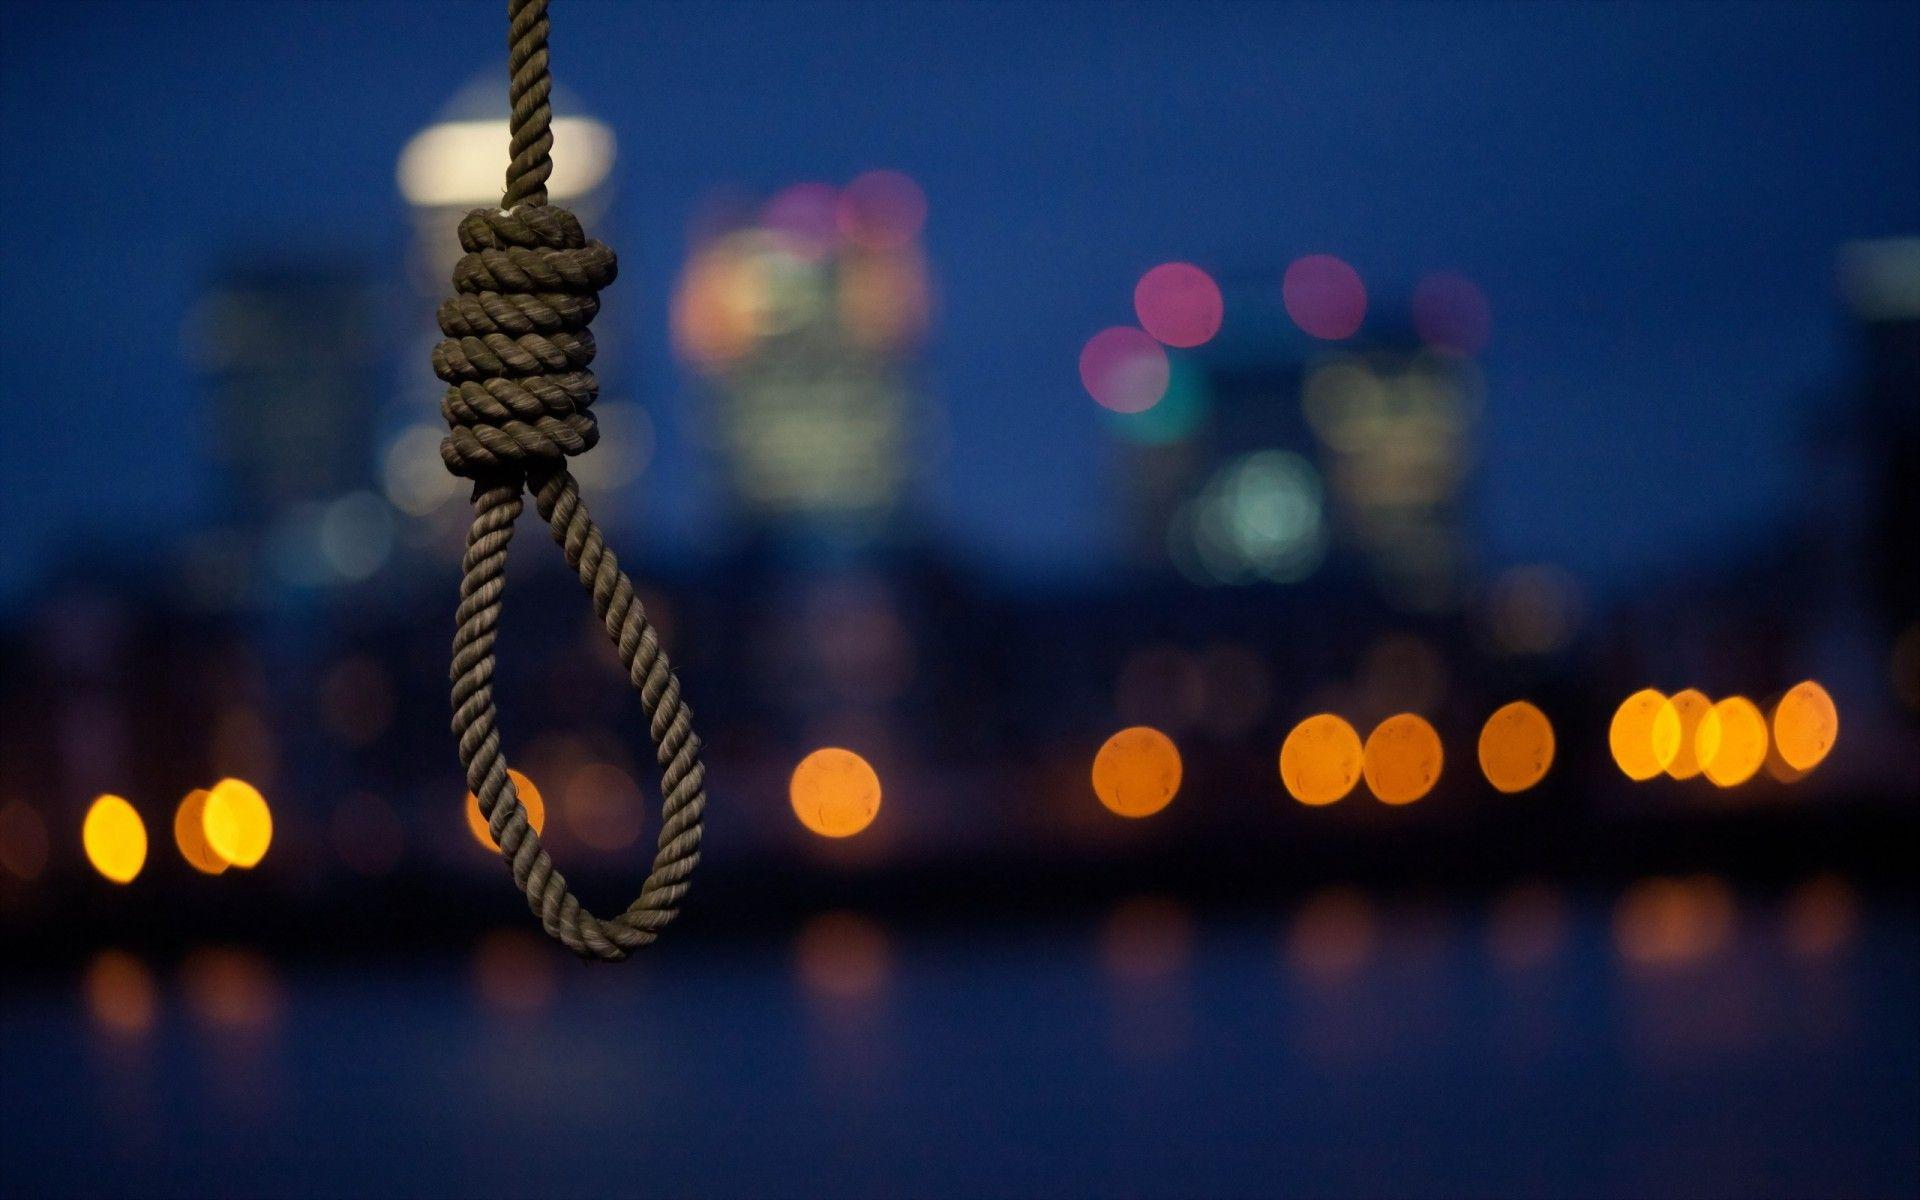 Noose Suicide Hanging Rope Cities Buildings Skyscrapers Mood Night .